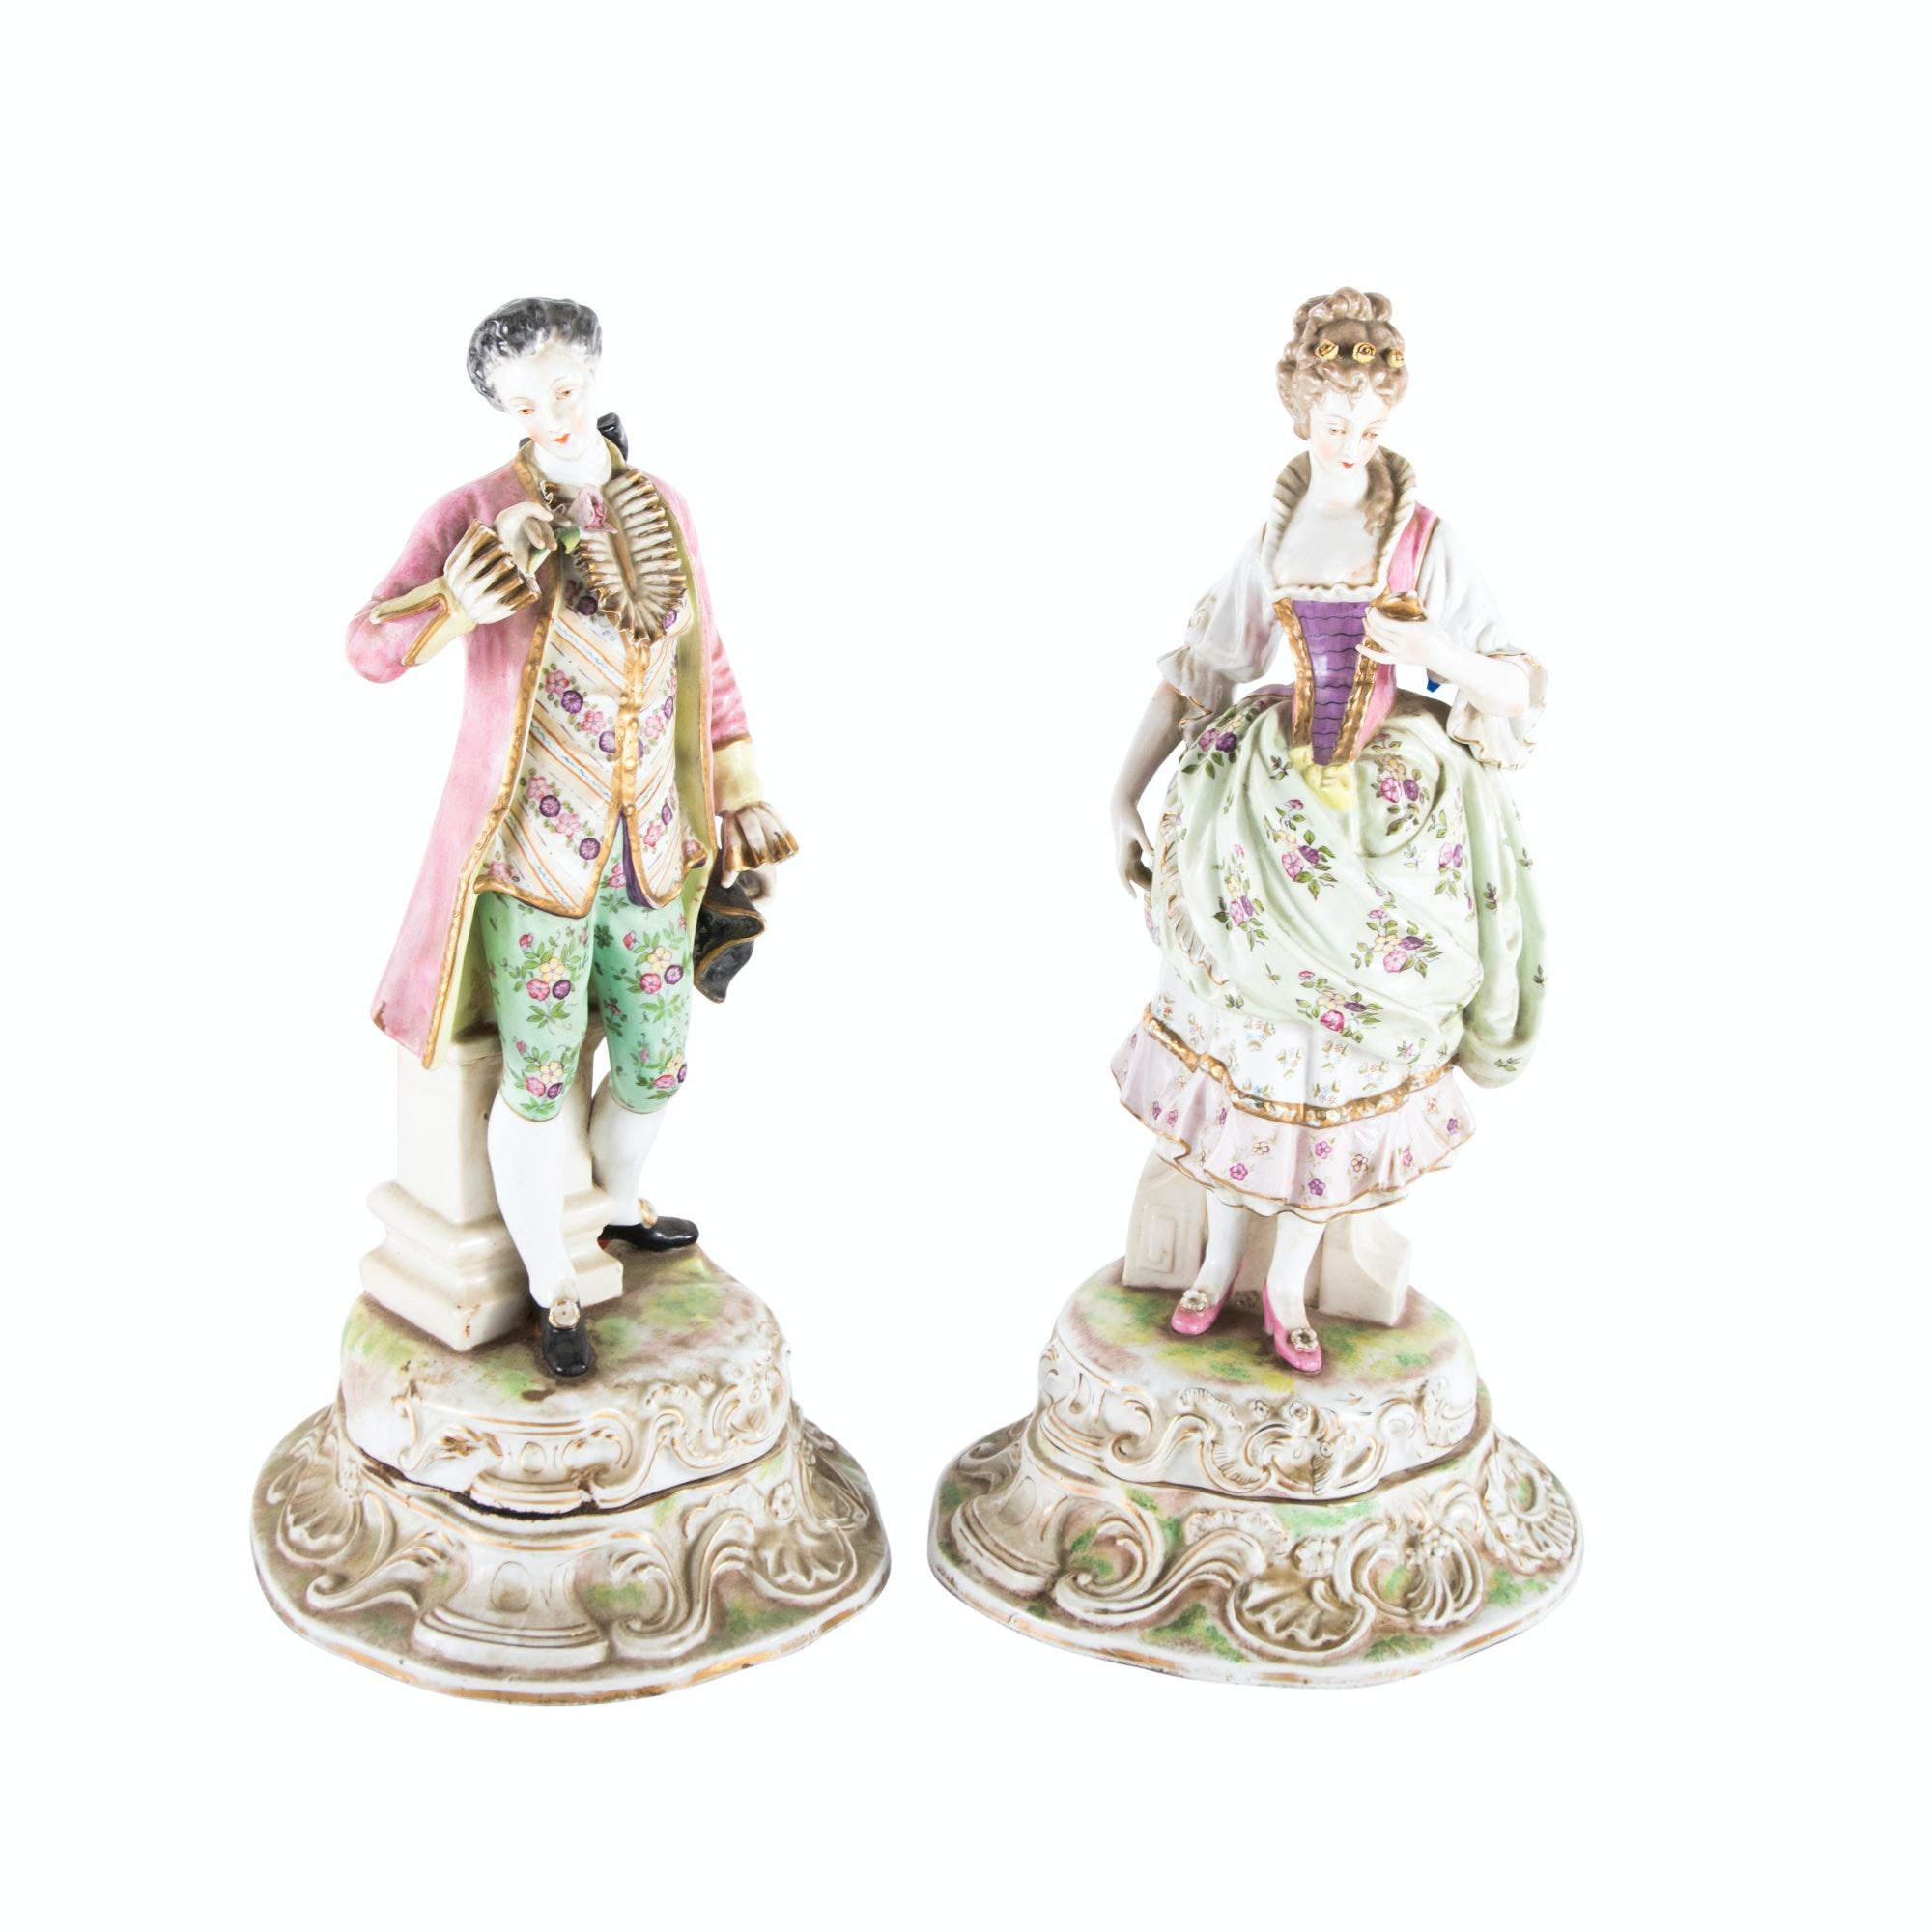 Pair of German Porcelain Figures, 20th Century